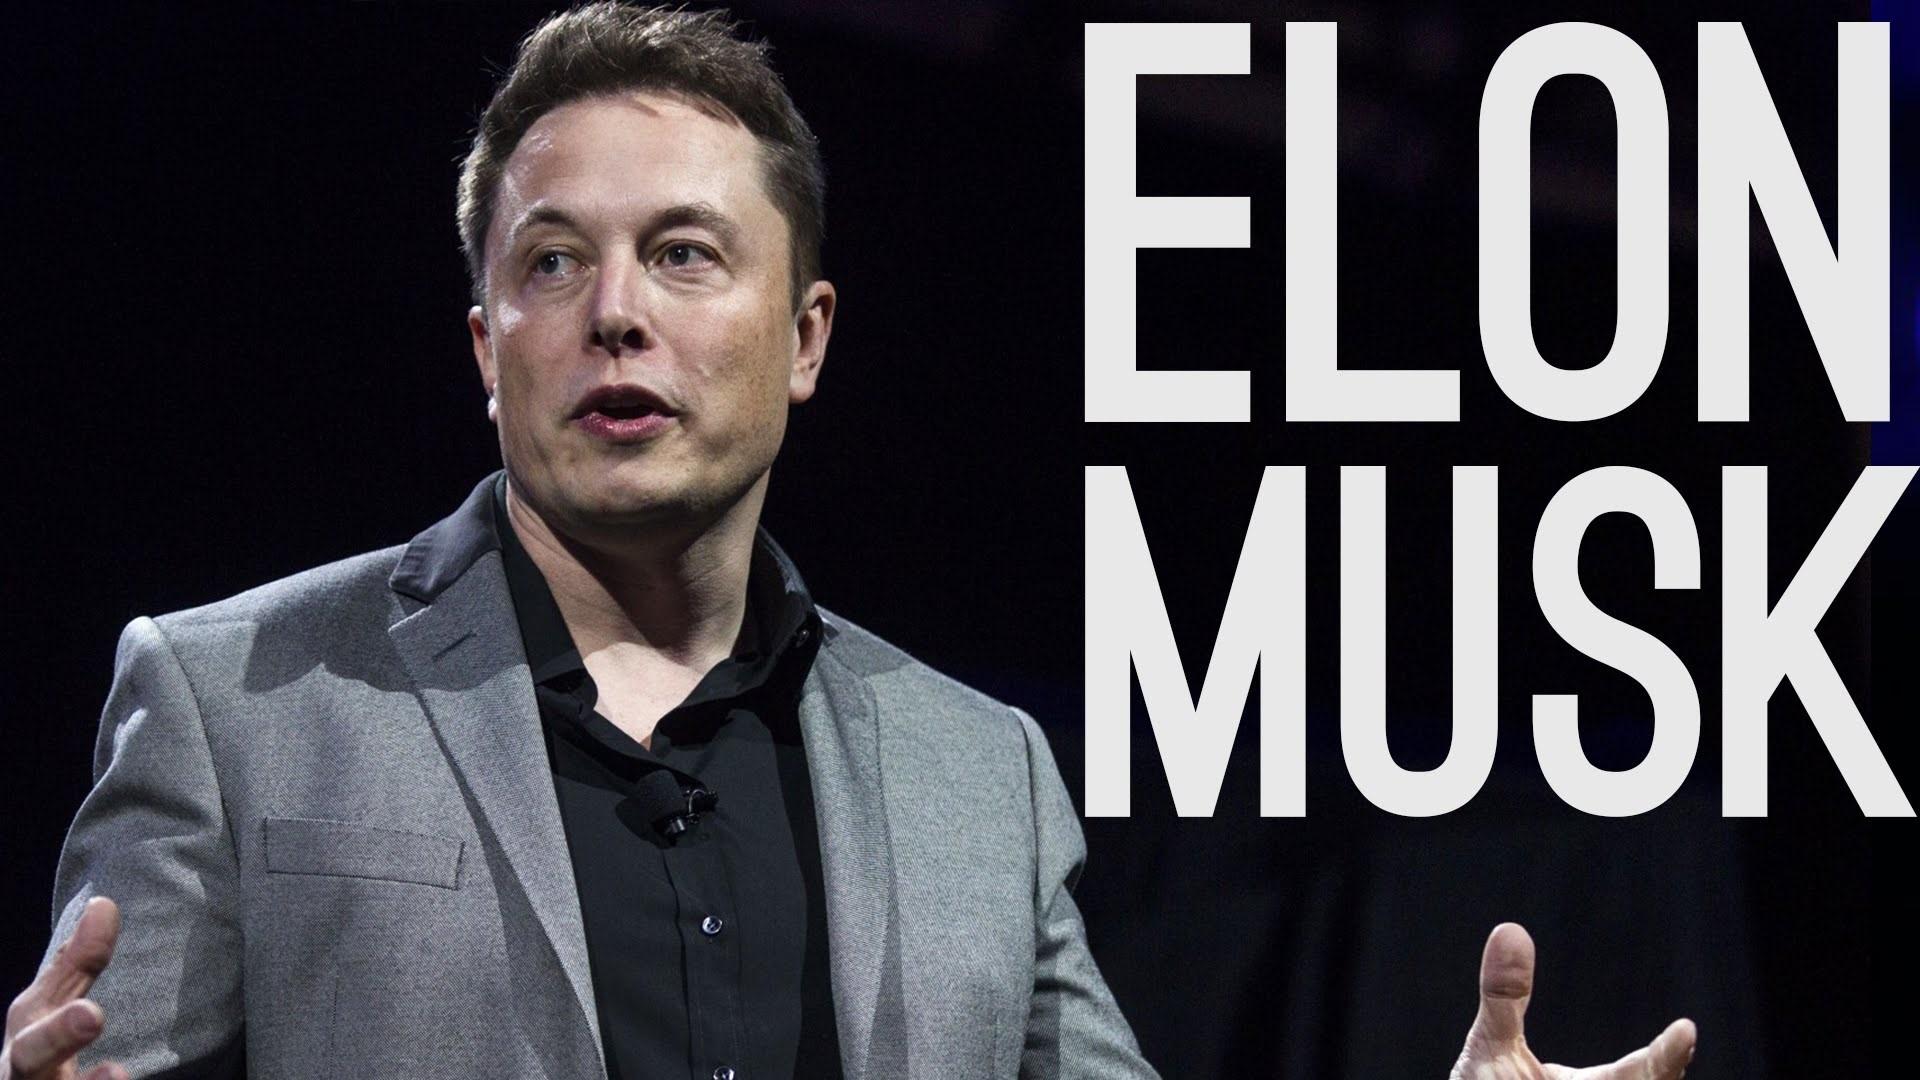 Elon Musk Photos